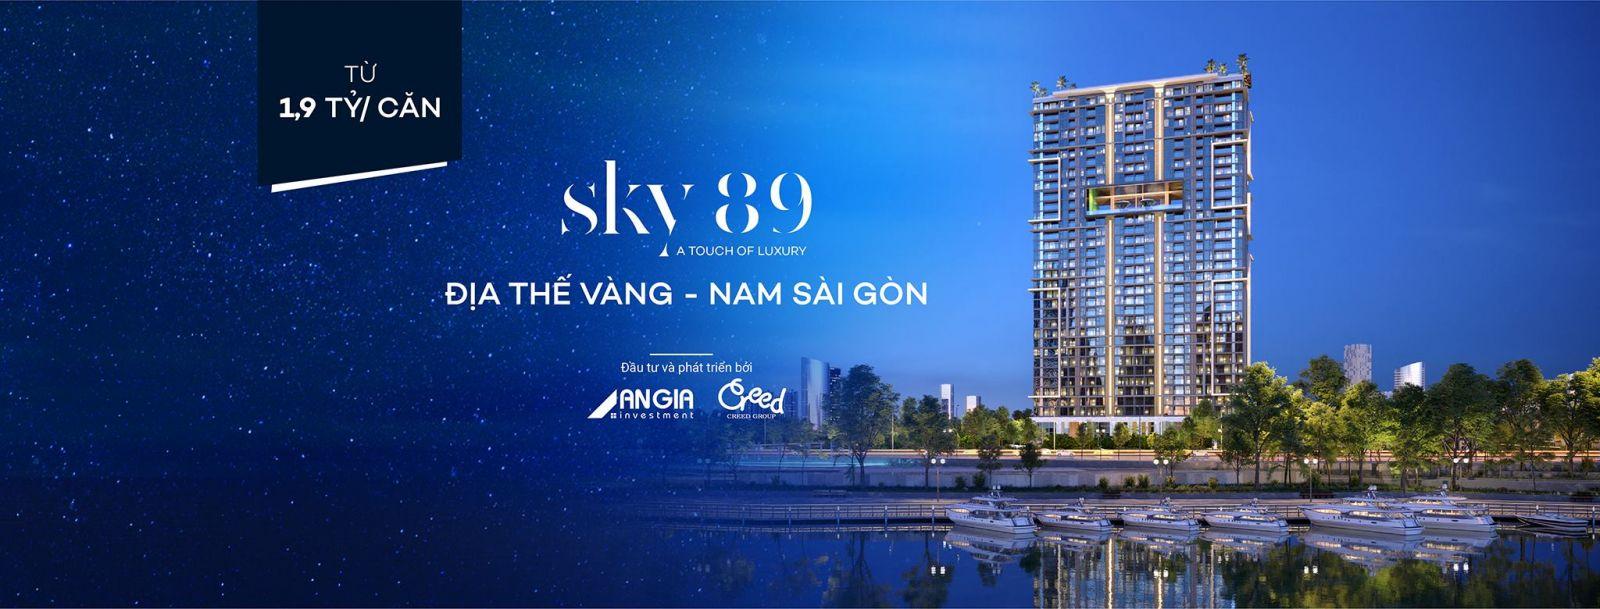 sky89 cuộc chơi mới tại khu nam